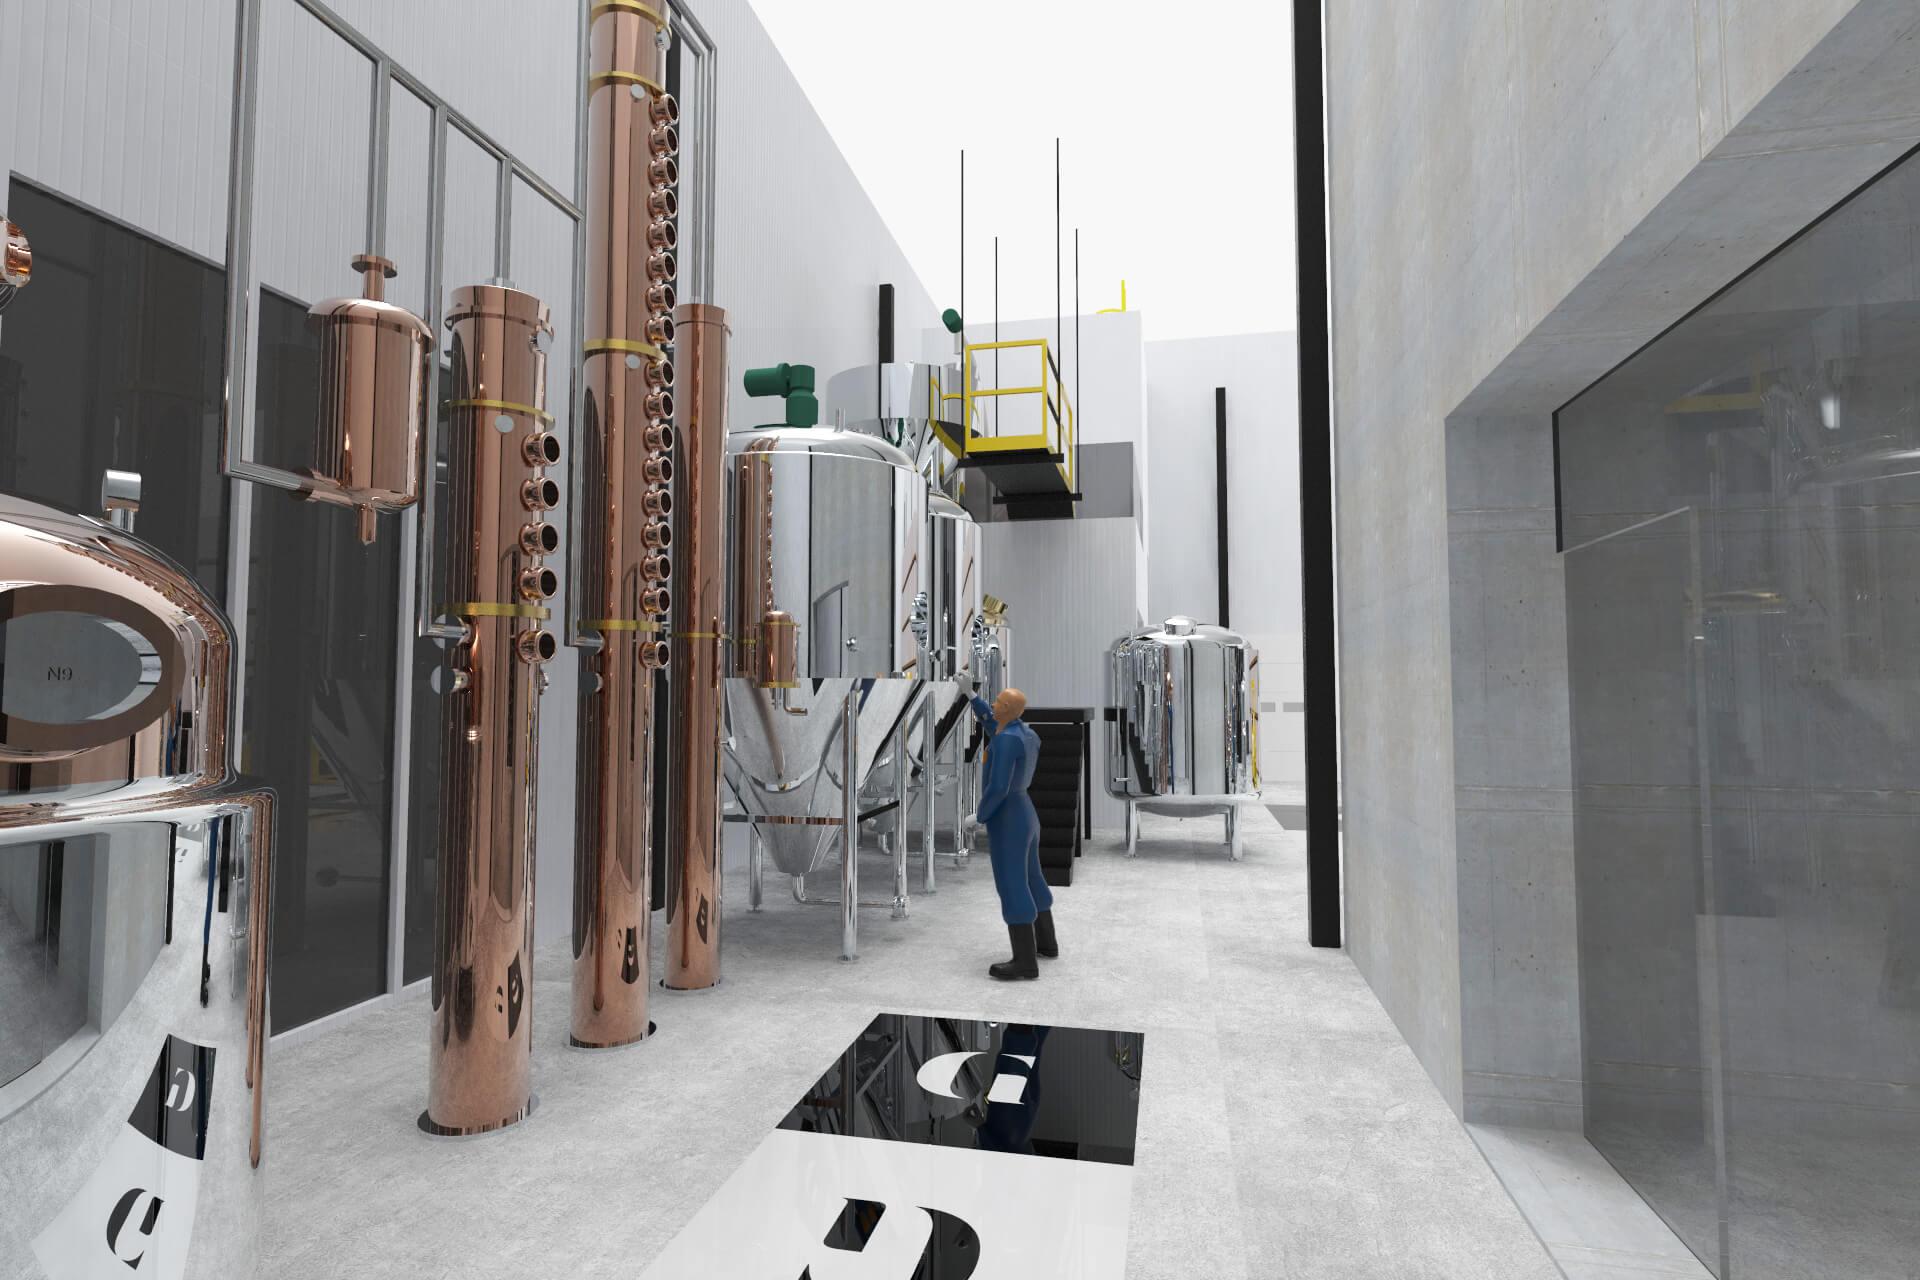 Plan microdistillierie